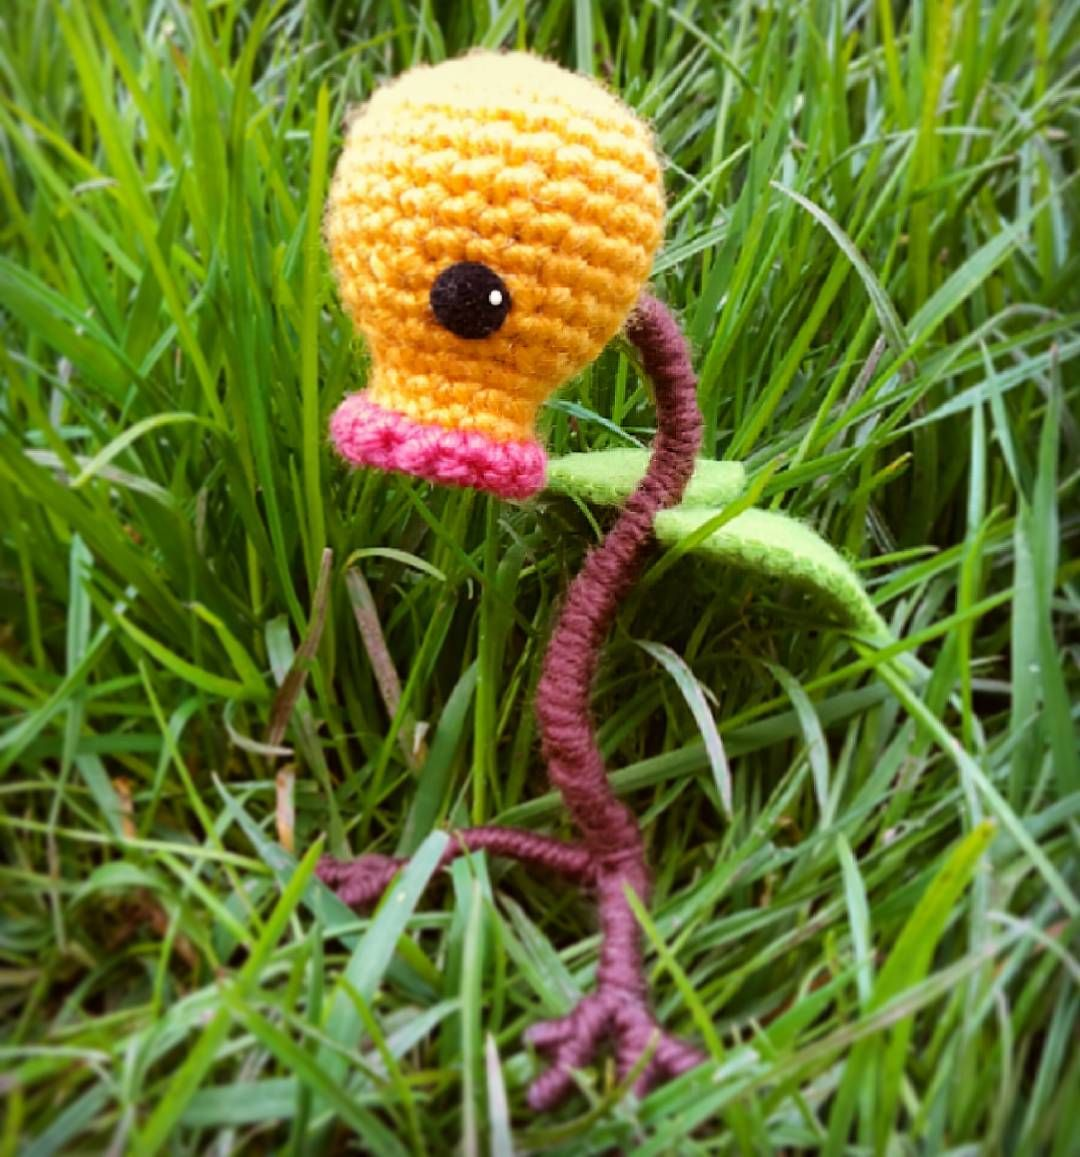 Bellsprout #häkelfigur #häkeln #crochet #crafted #handcrafted ...